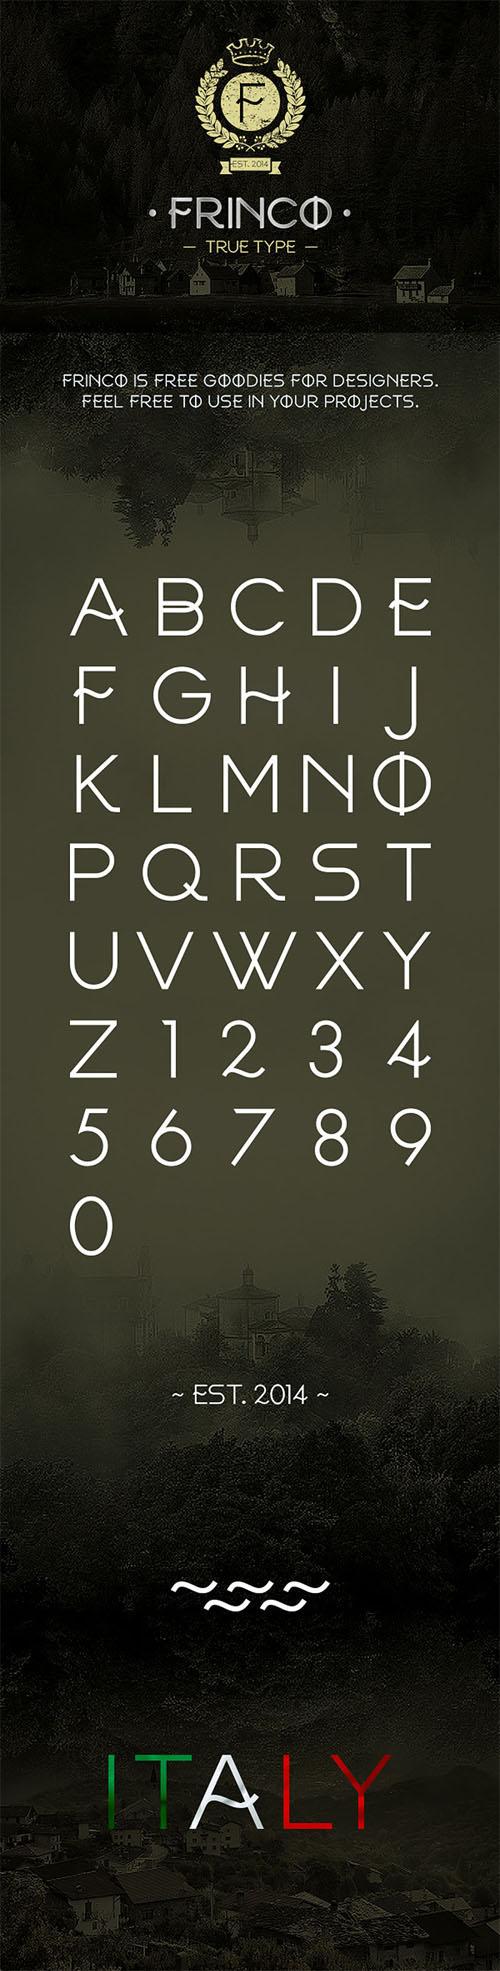 Frinco Creative Font